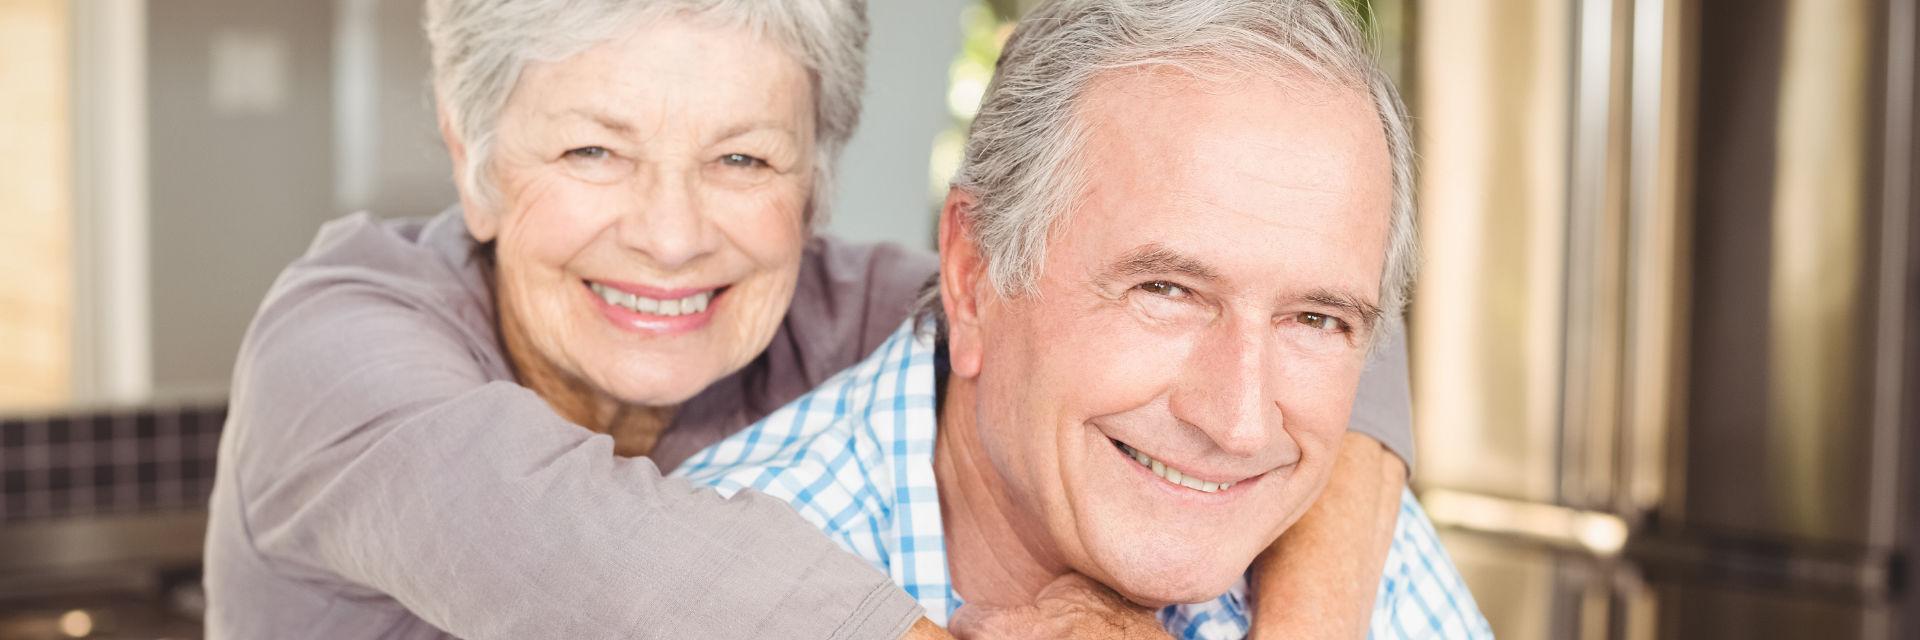 A broadly smiling senior couple.